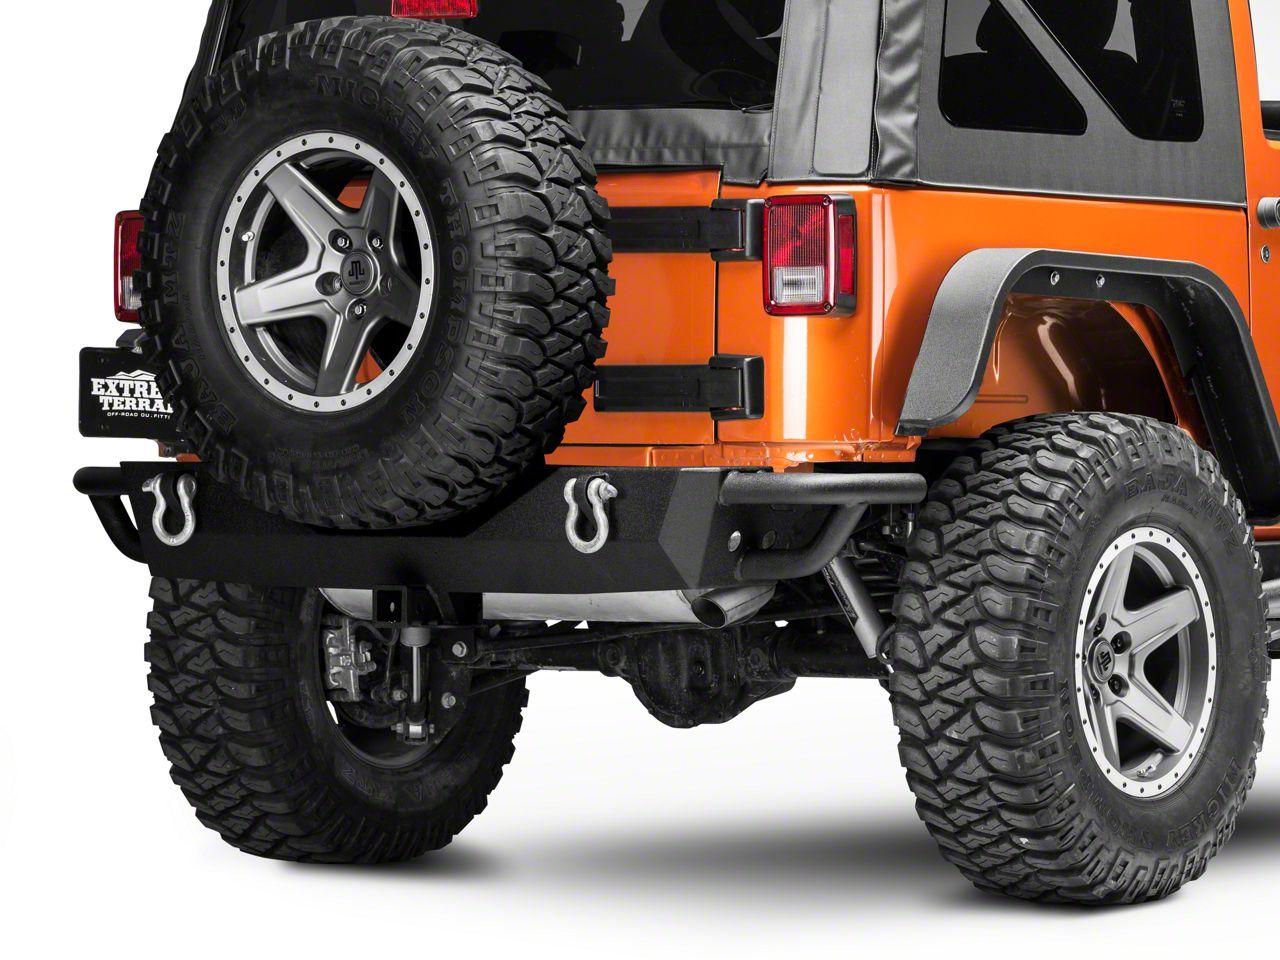 RedRock 4x4 Full Width HD Rock Crawler Rear Bumper (07-18 Jeep Wrangler JK)